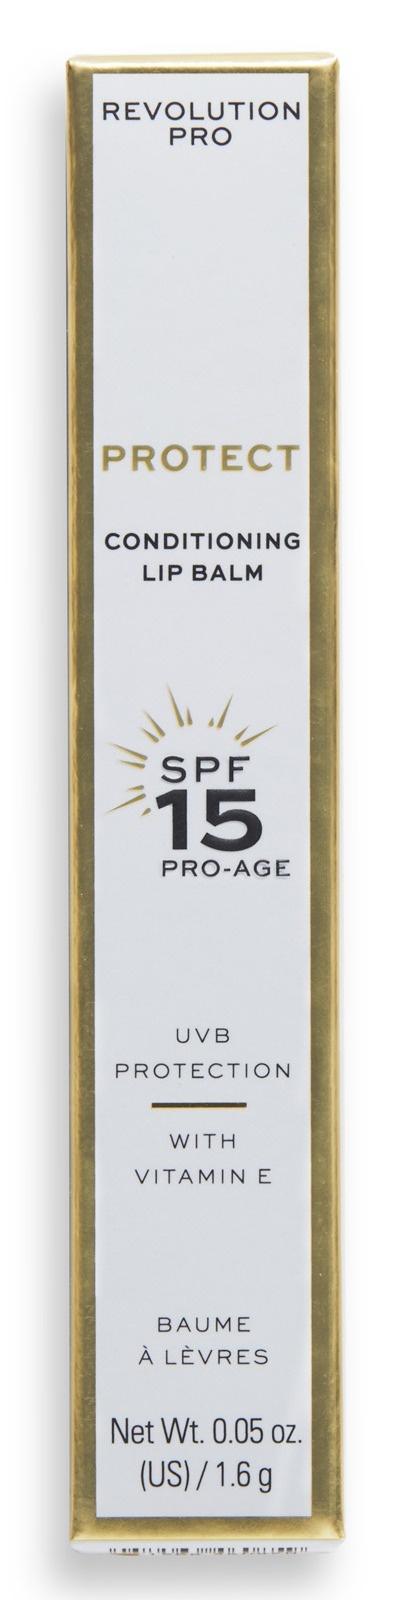 Revolution Pro Protect Conditioning Lip Balm SPF 15